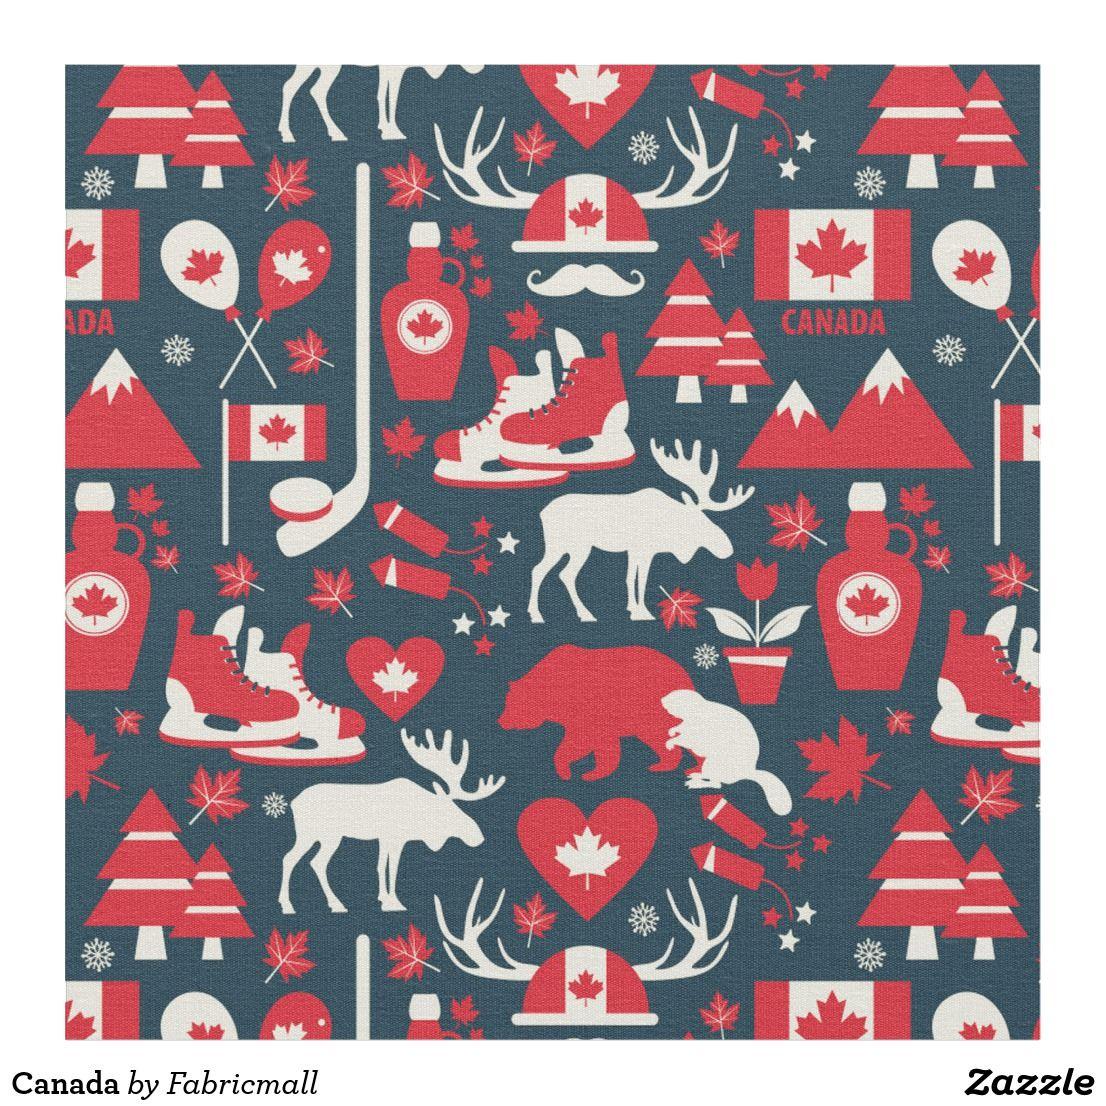 Canada Fabric Fabric patterns, Canadian christmas, Fabric